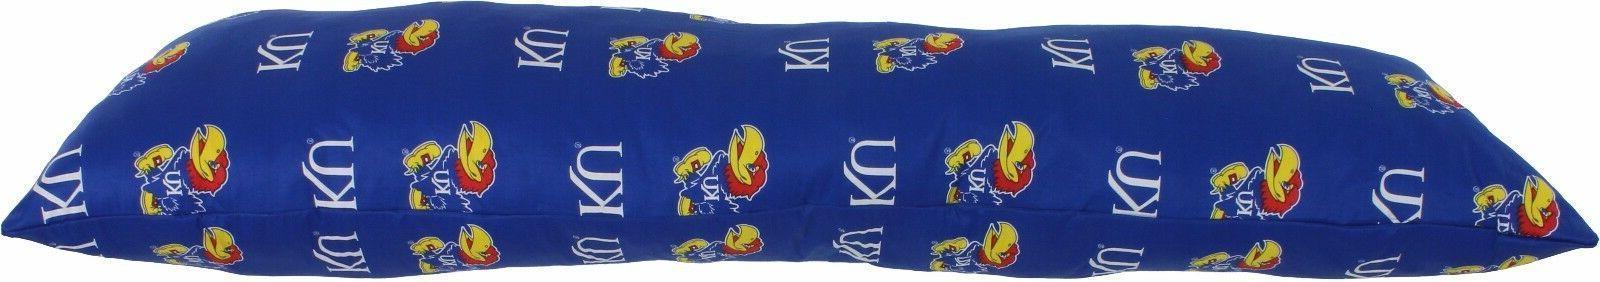 "Kansas Jayhawks Printed Pillow 60"""